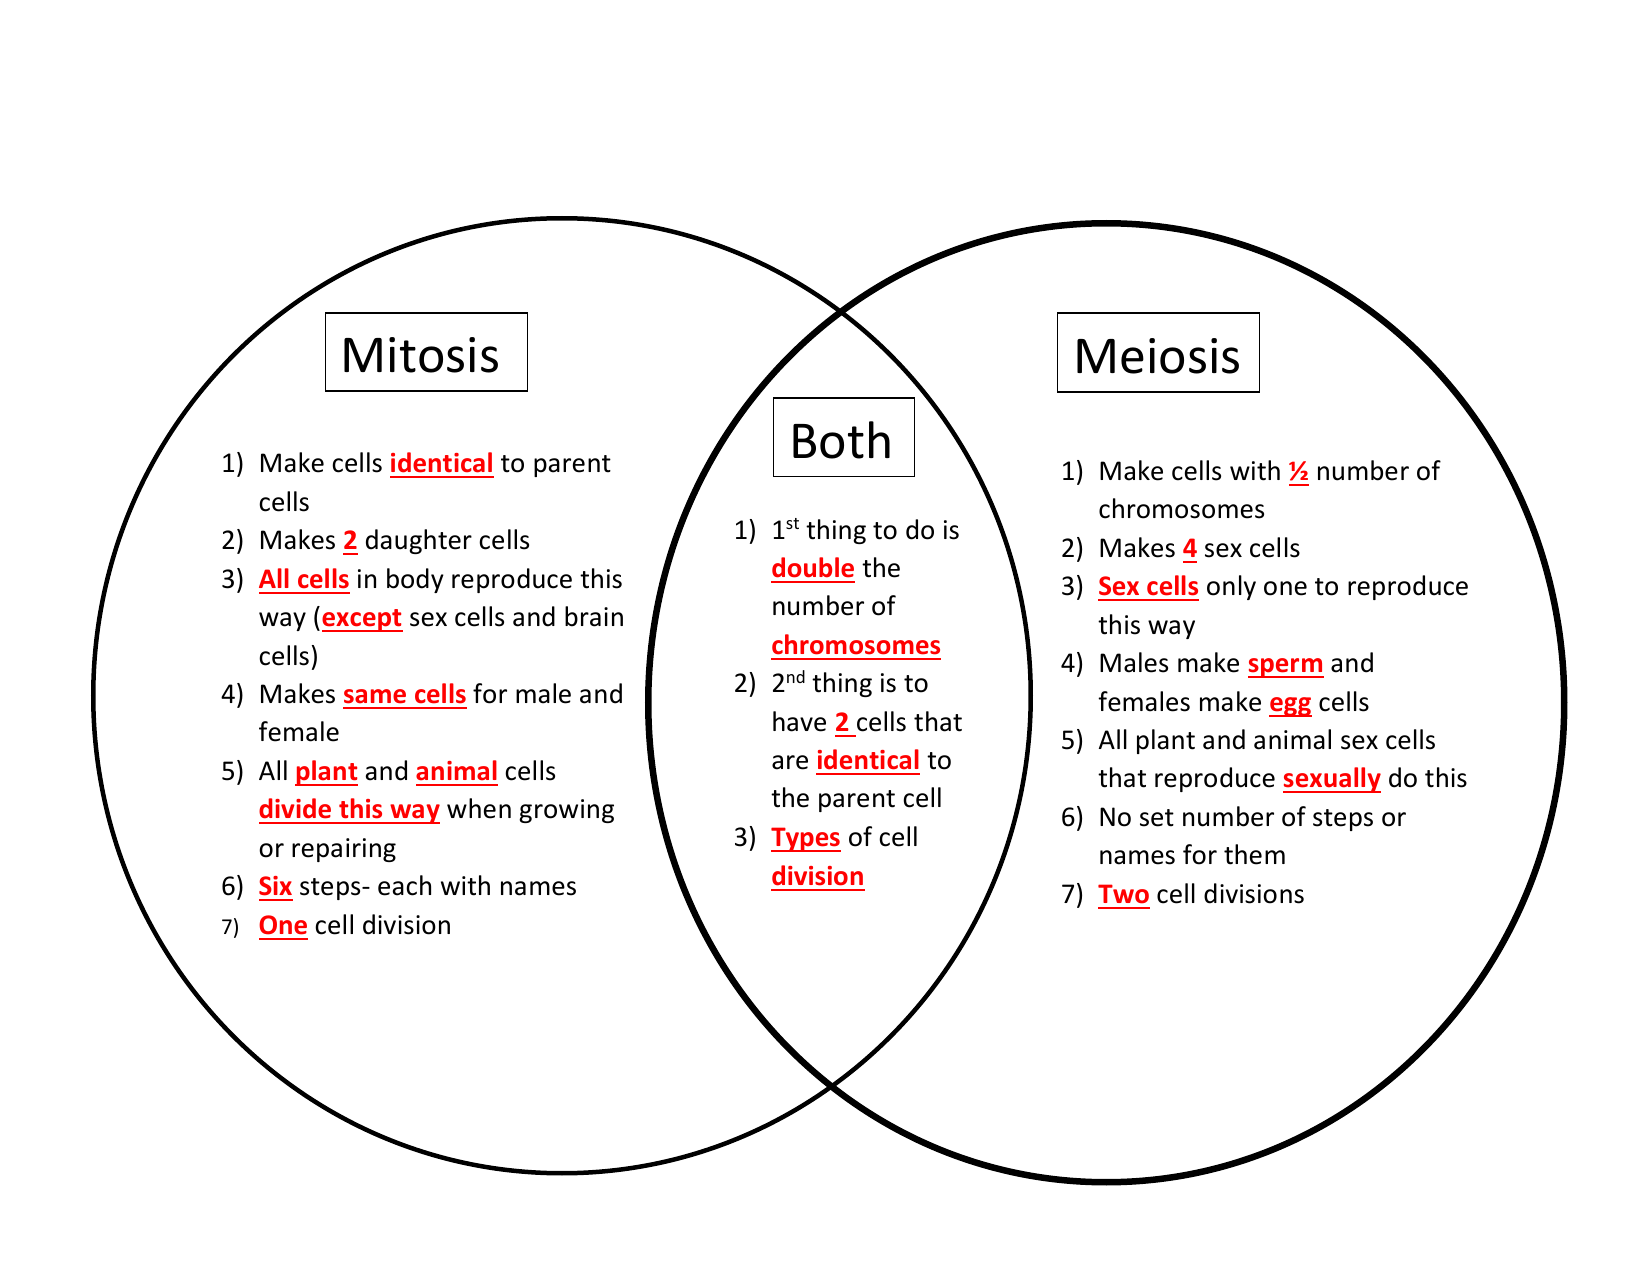 34 Mitosis Vs Meiosis Venn Diagram - Wiring Diagram Database